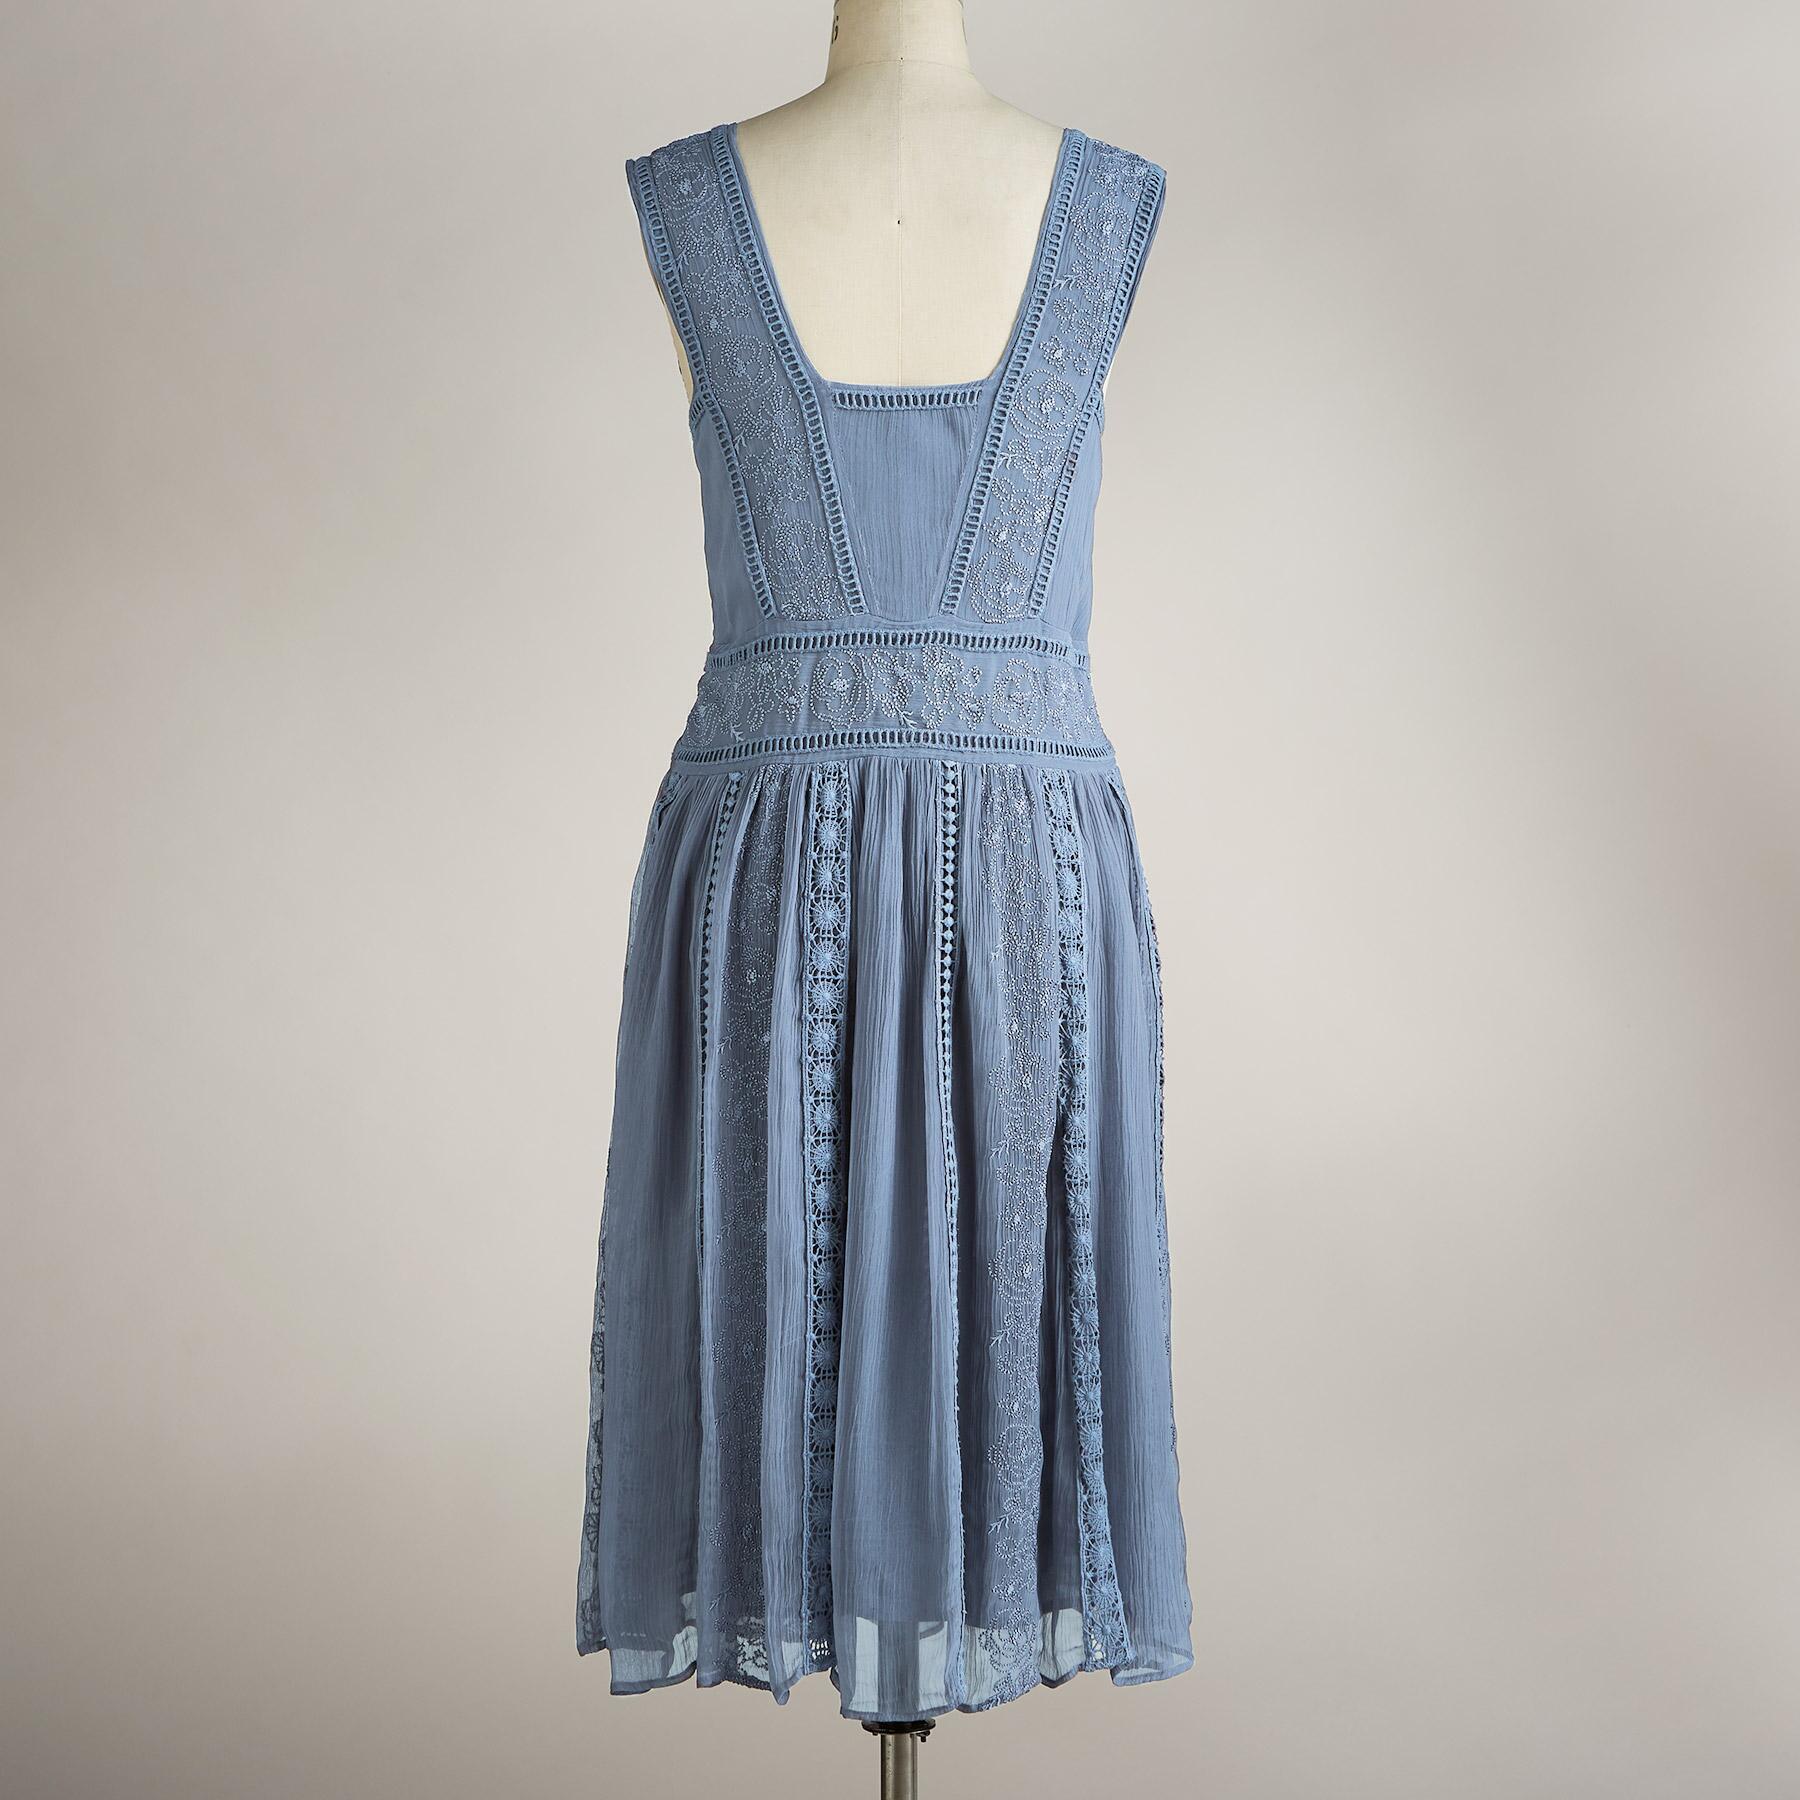 JOLI EMBROIDERY DRESS PETITE: View 2